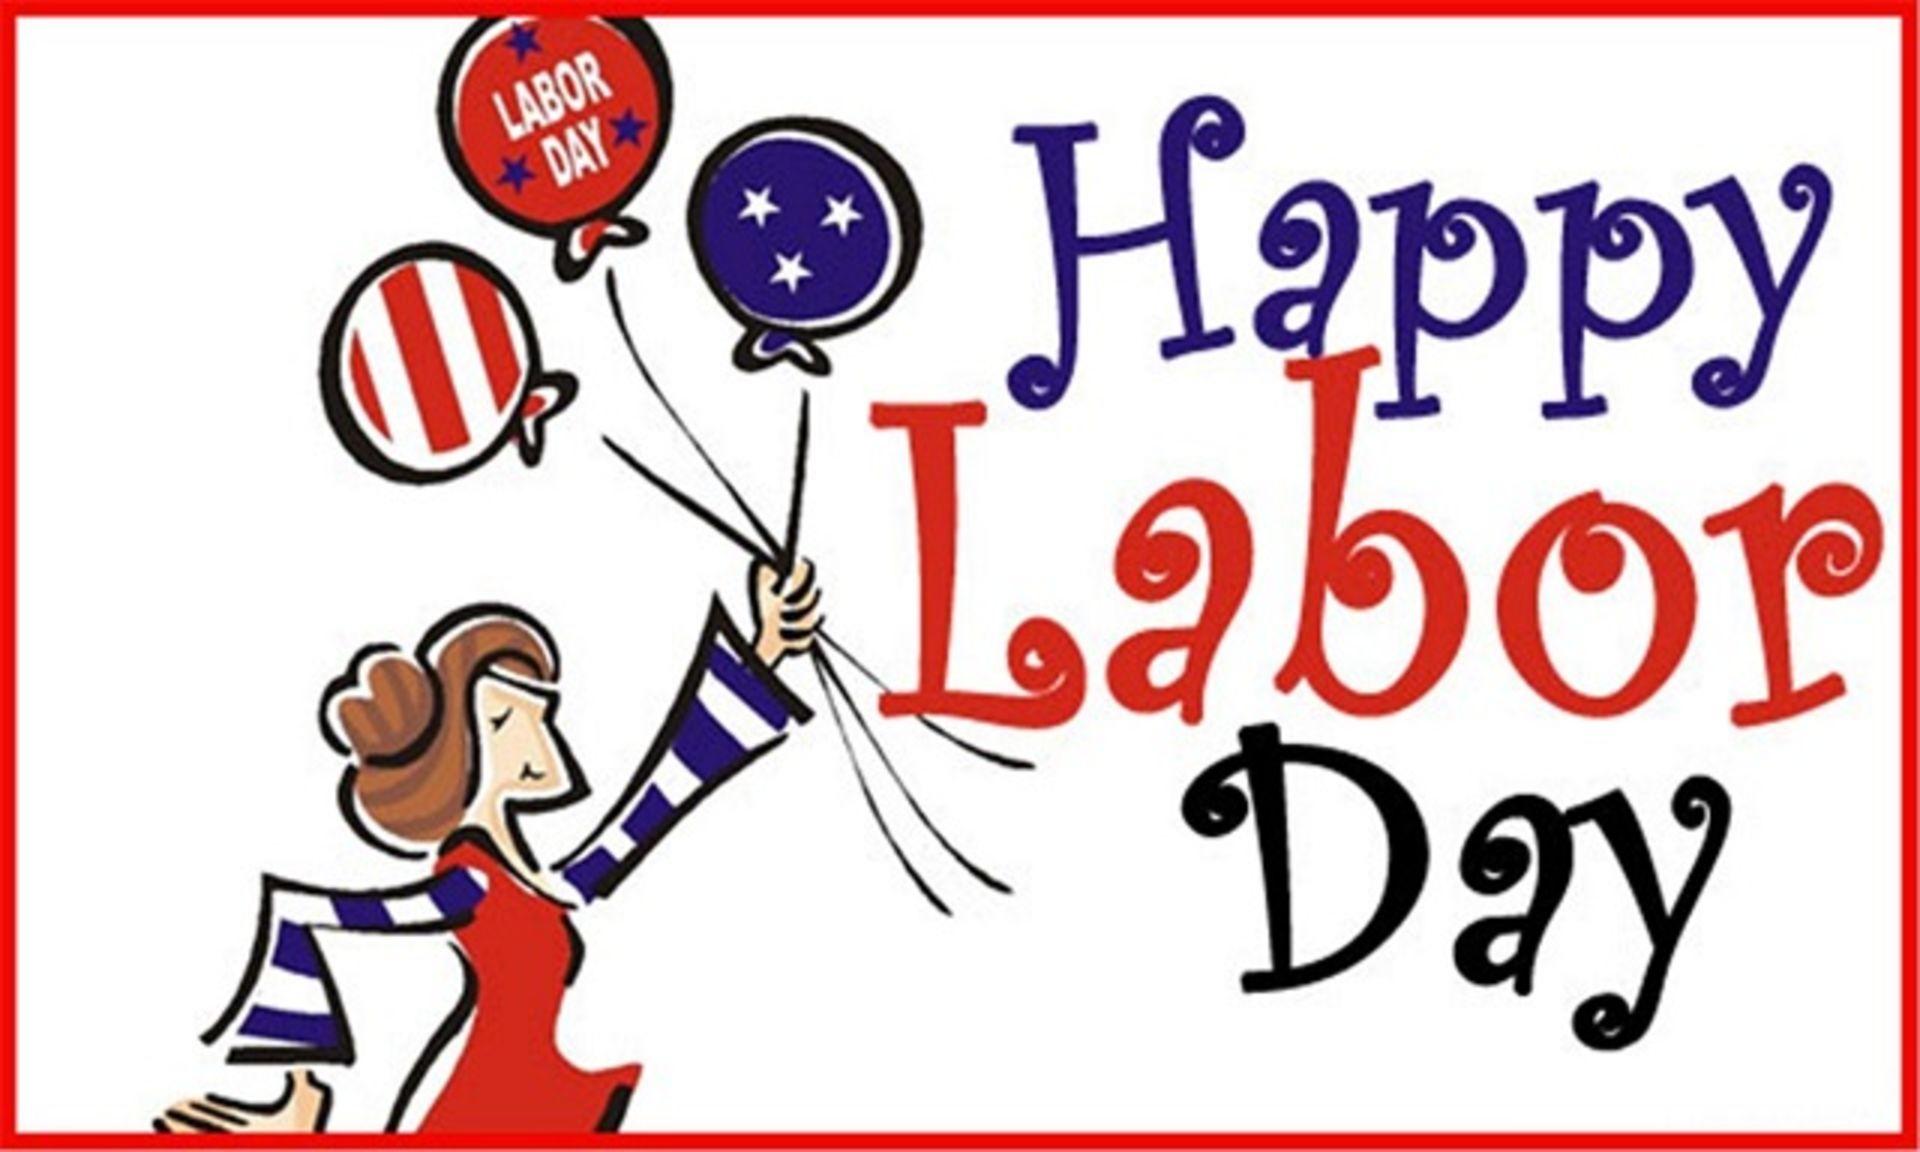 Labor Day Weekend Fun!